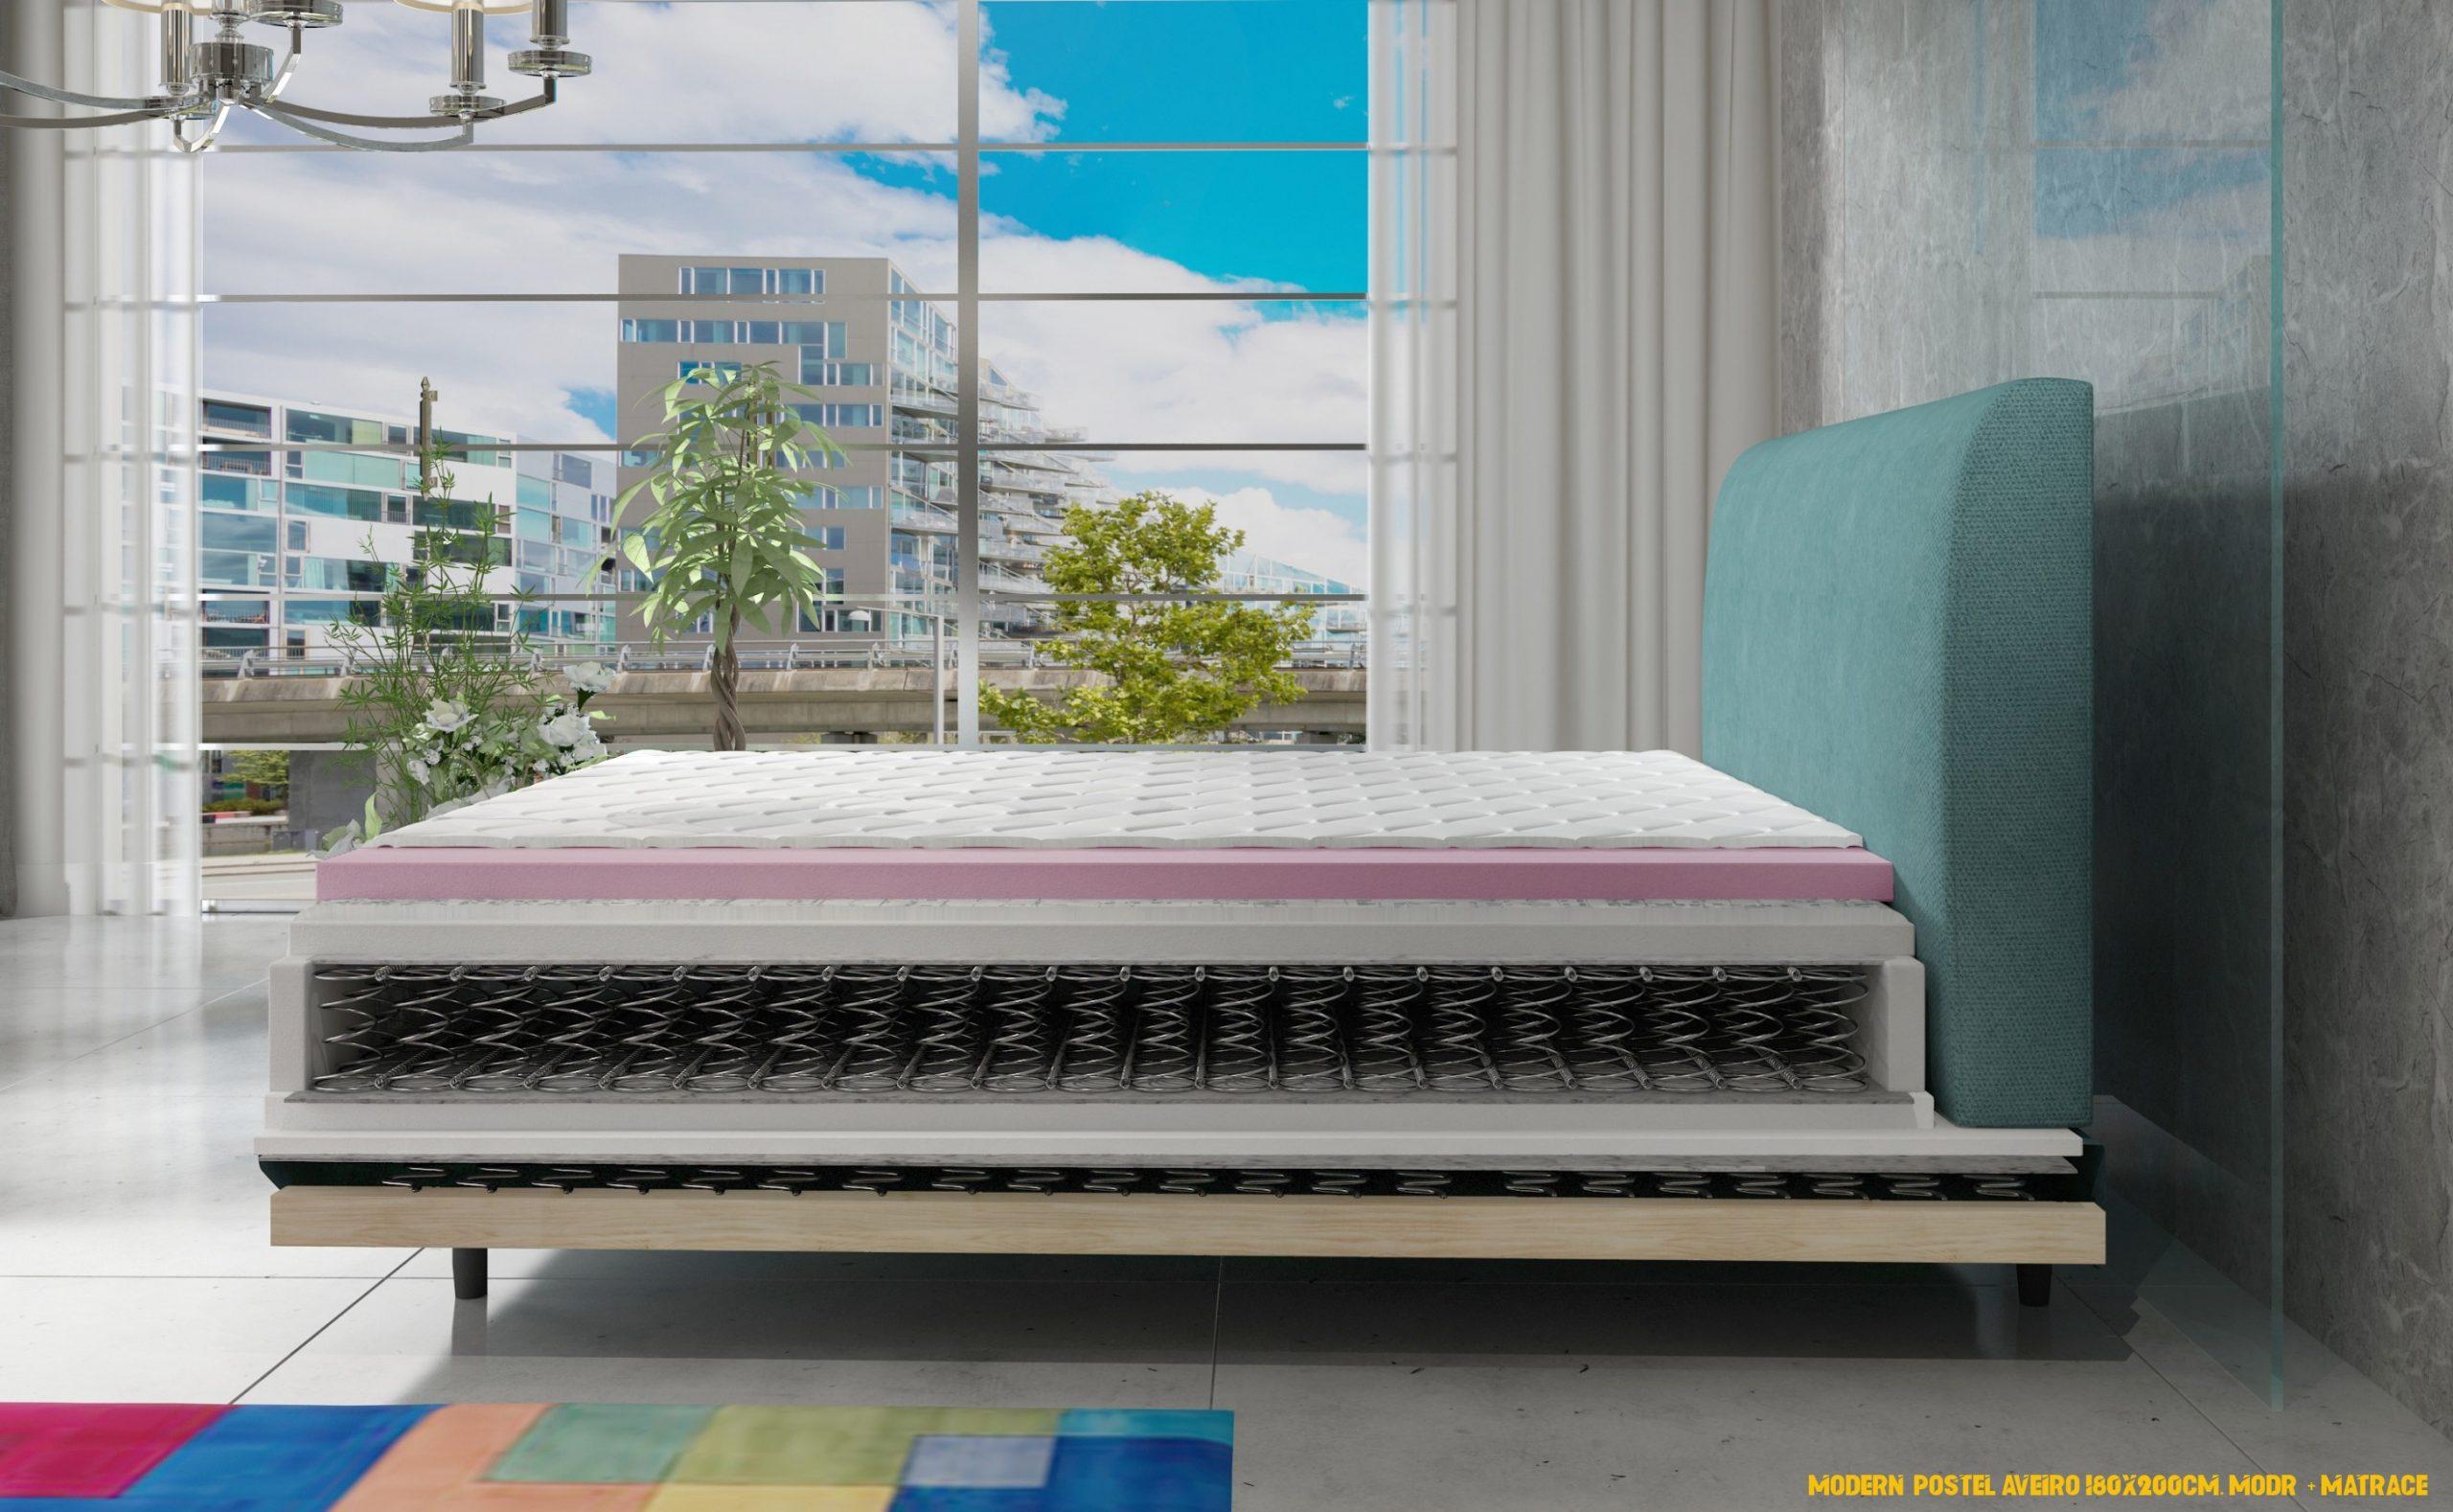 Moderní postel Aveiro 180x200cm, modrá + matrace